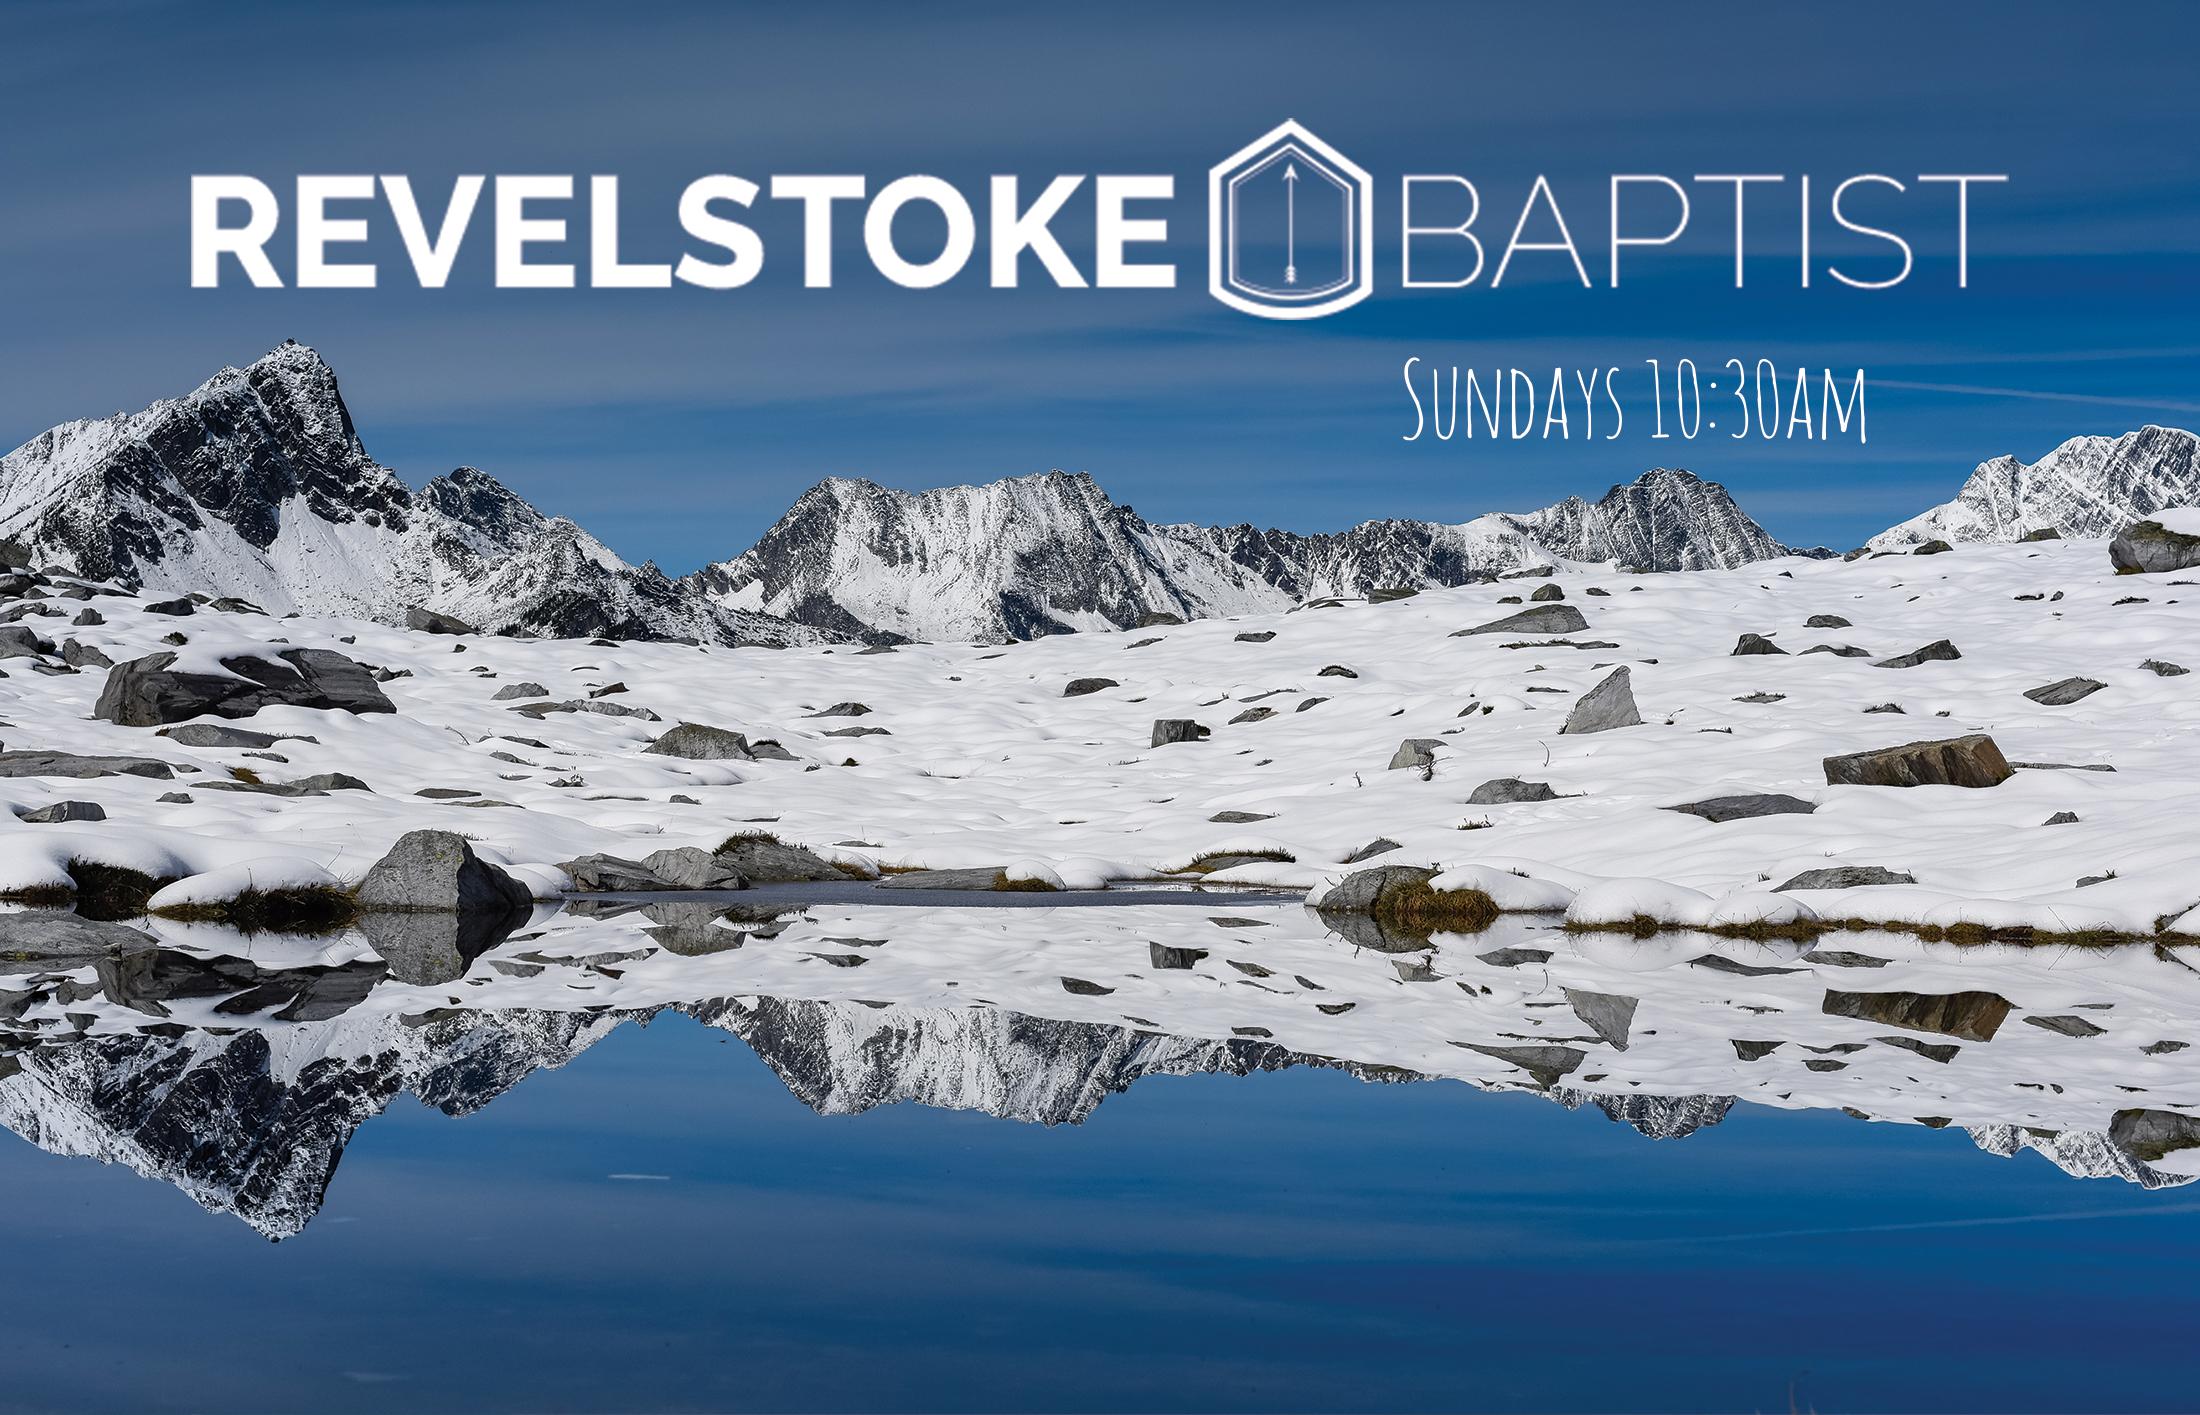 Revelstoke Baptist Sunday Service @ Revelstoke Baptist |  |  |